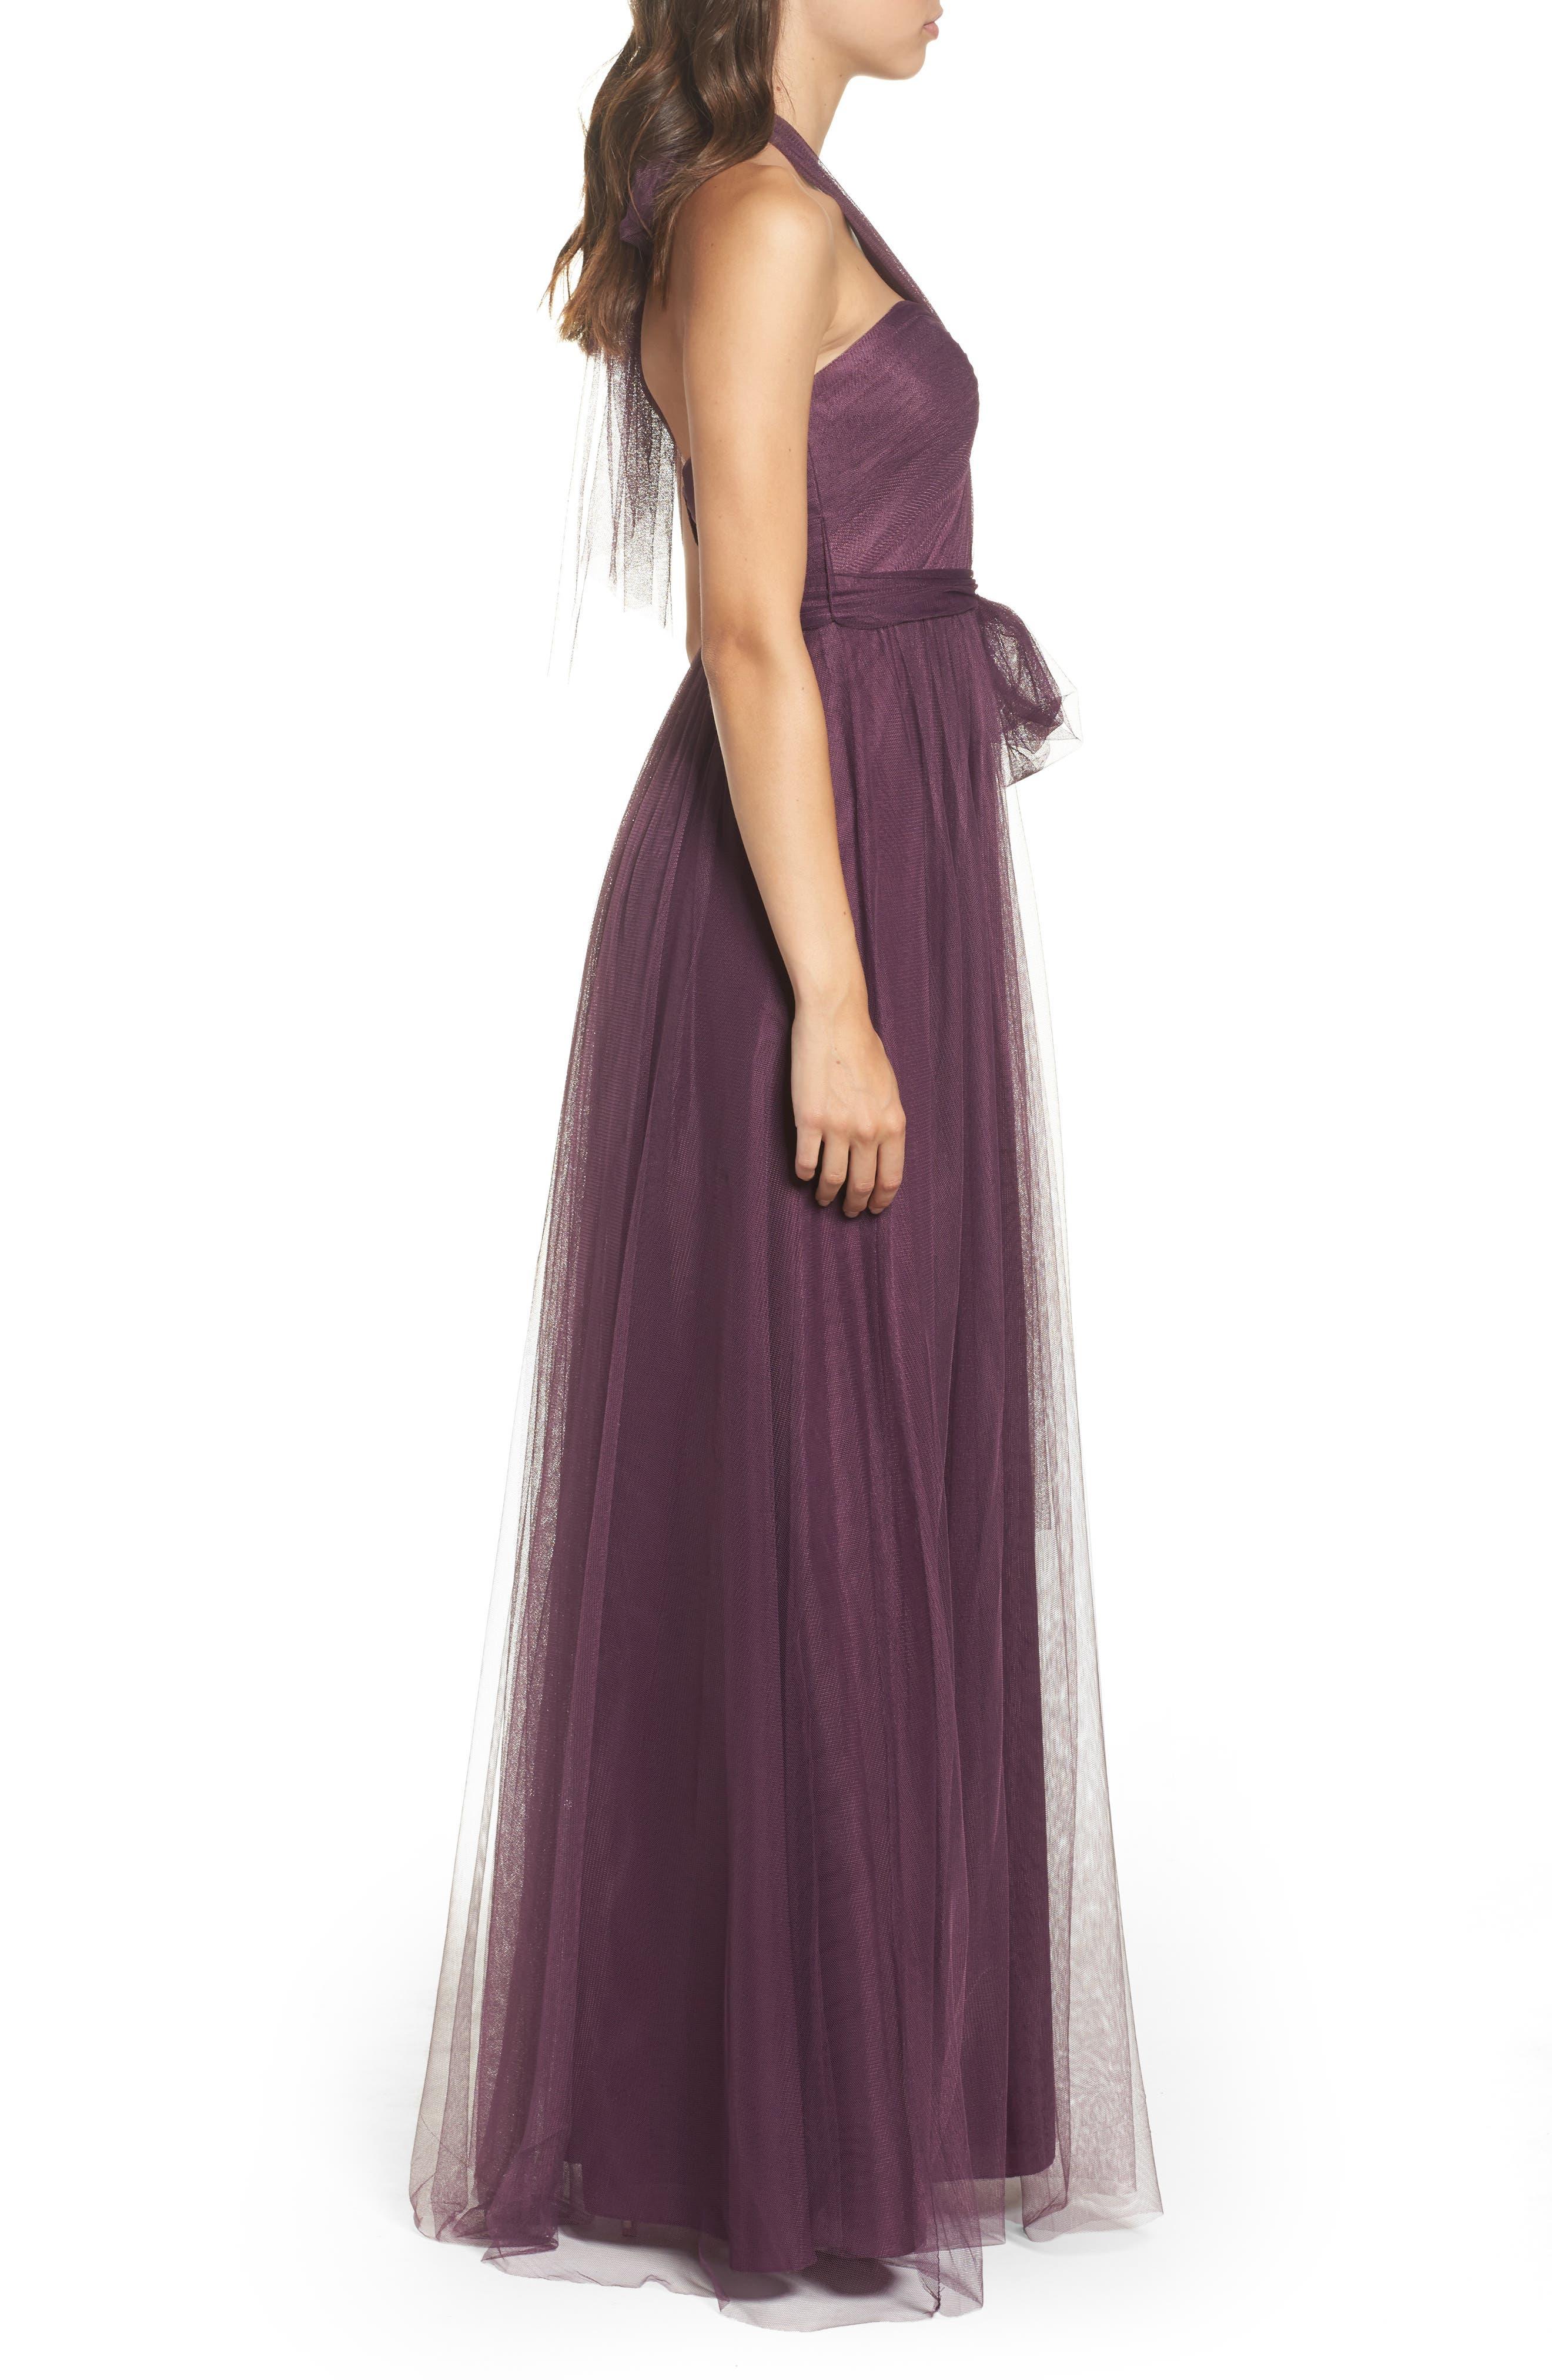 Annabelle Convertible Tulle Column Dress,                             Alternate thumbnail 4, color,                             Raisin